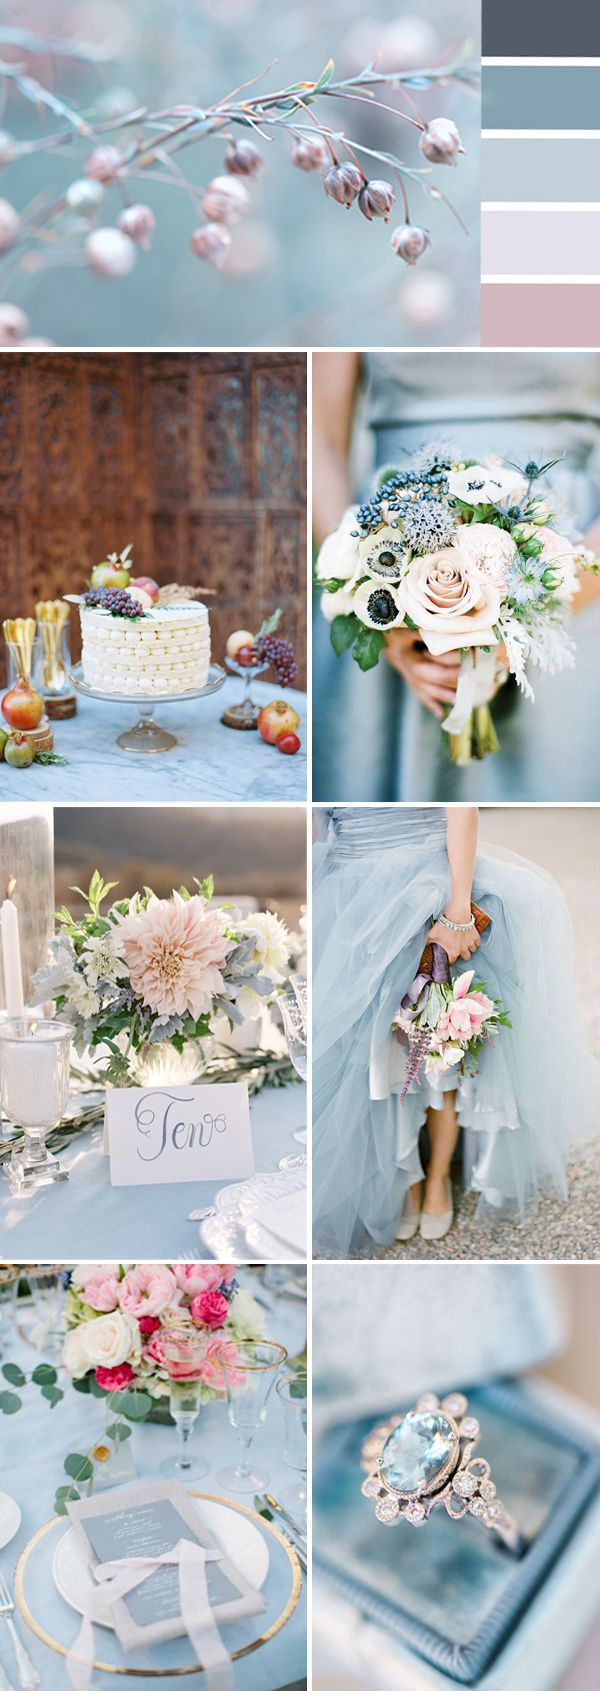 Top 10 Wedding Color Ideas For 2017 Spring Spring Wedding Colors Wedding Palette Wedding Colors